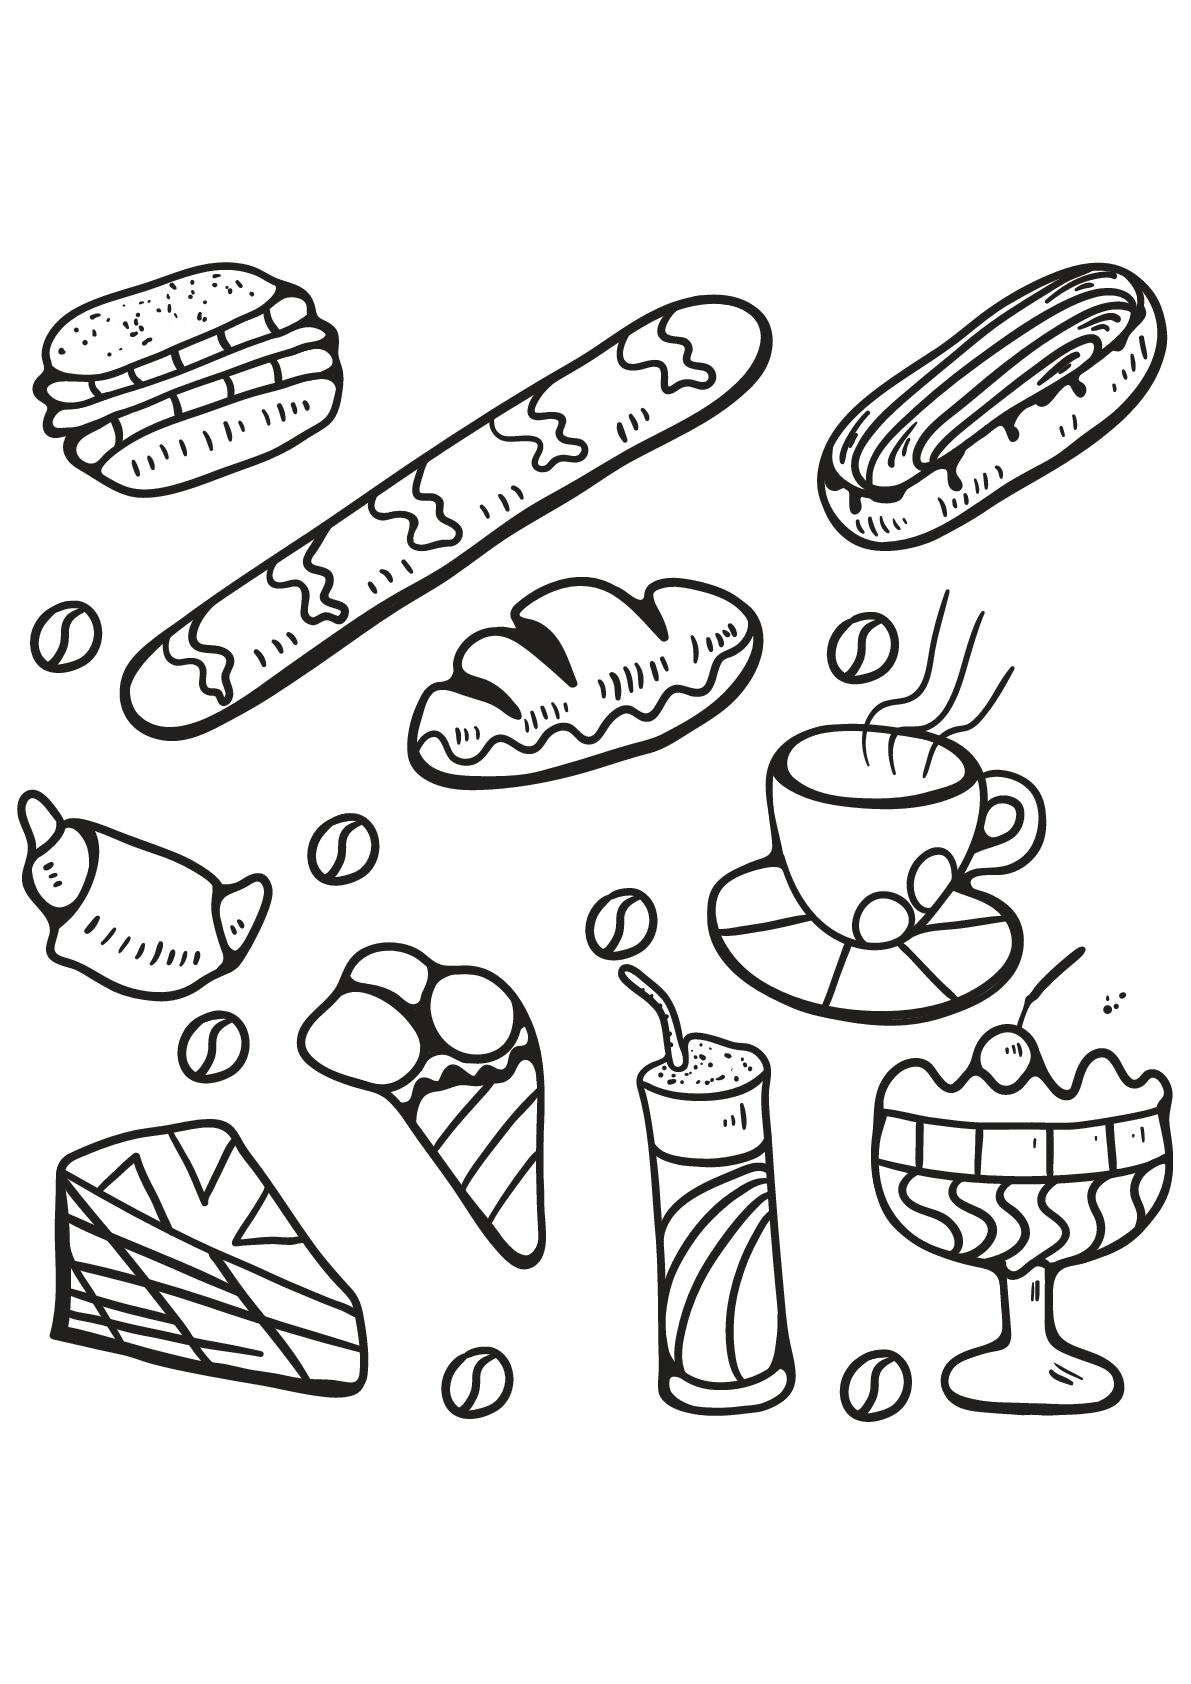 Cupcake 5 - Image avec : Papillon